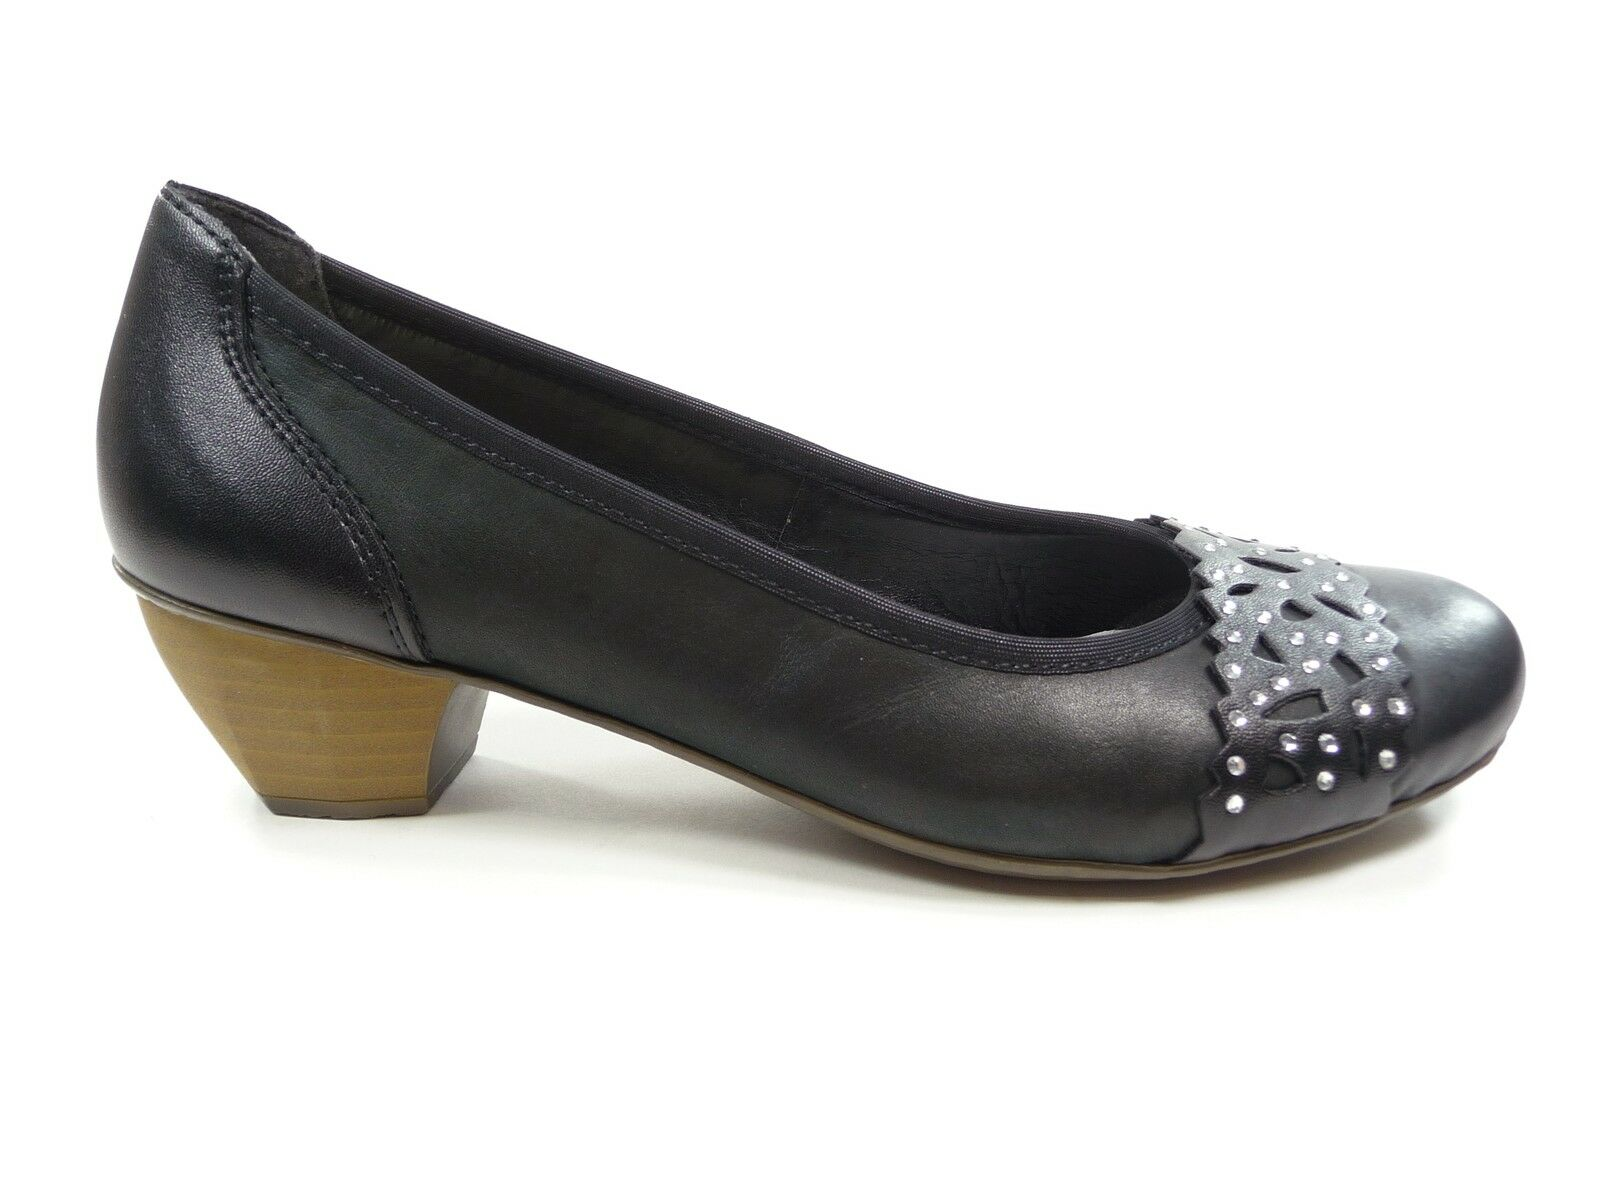 Rieker Schuhe Damenschuhe Pumps in Schwarz mit Art.Nr.41791-00